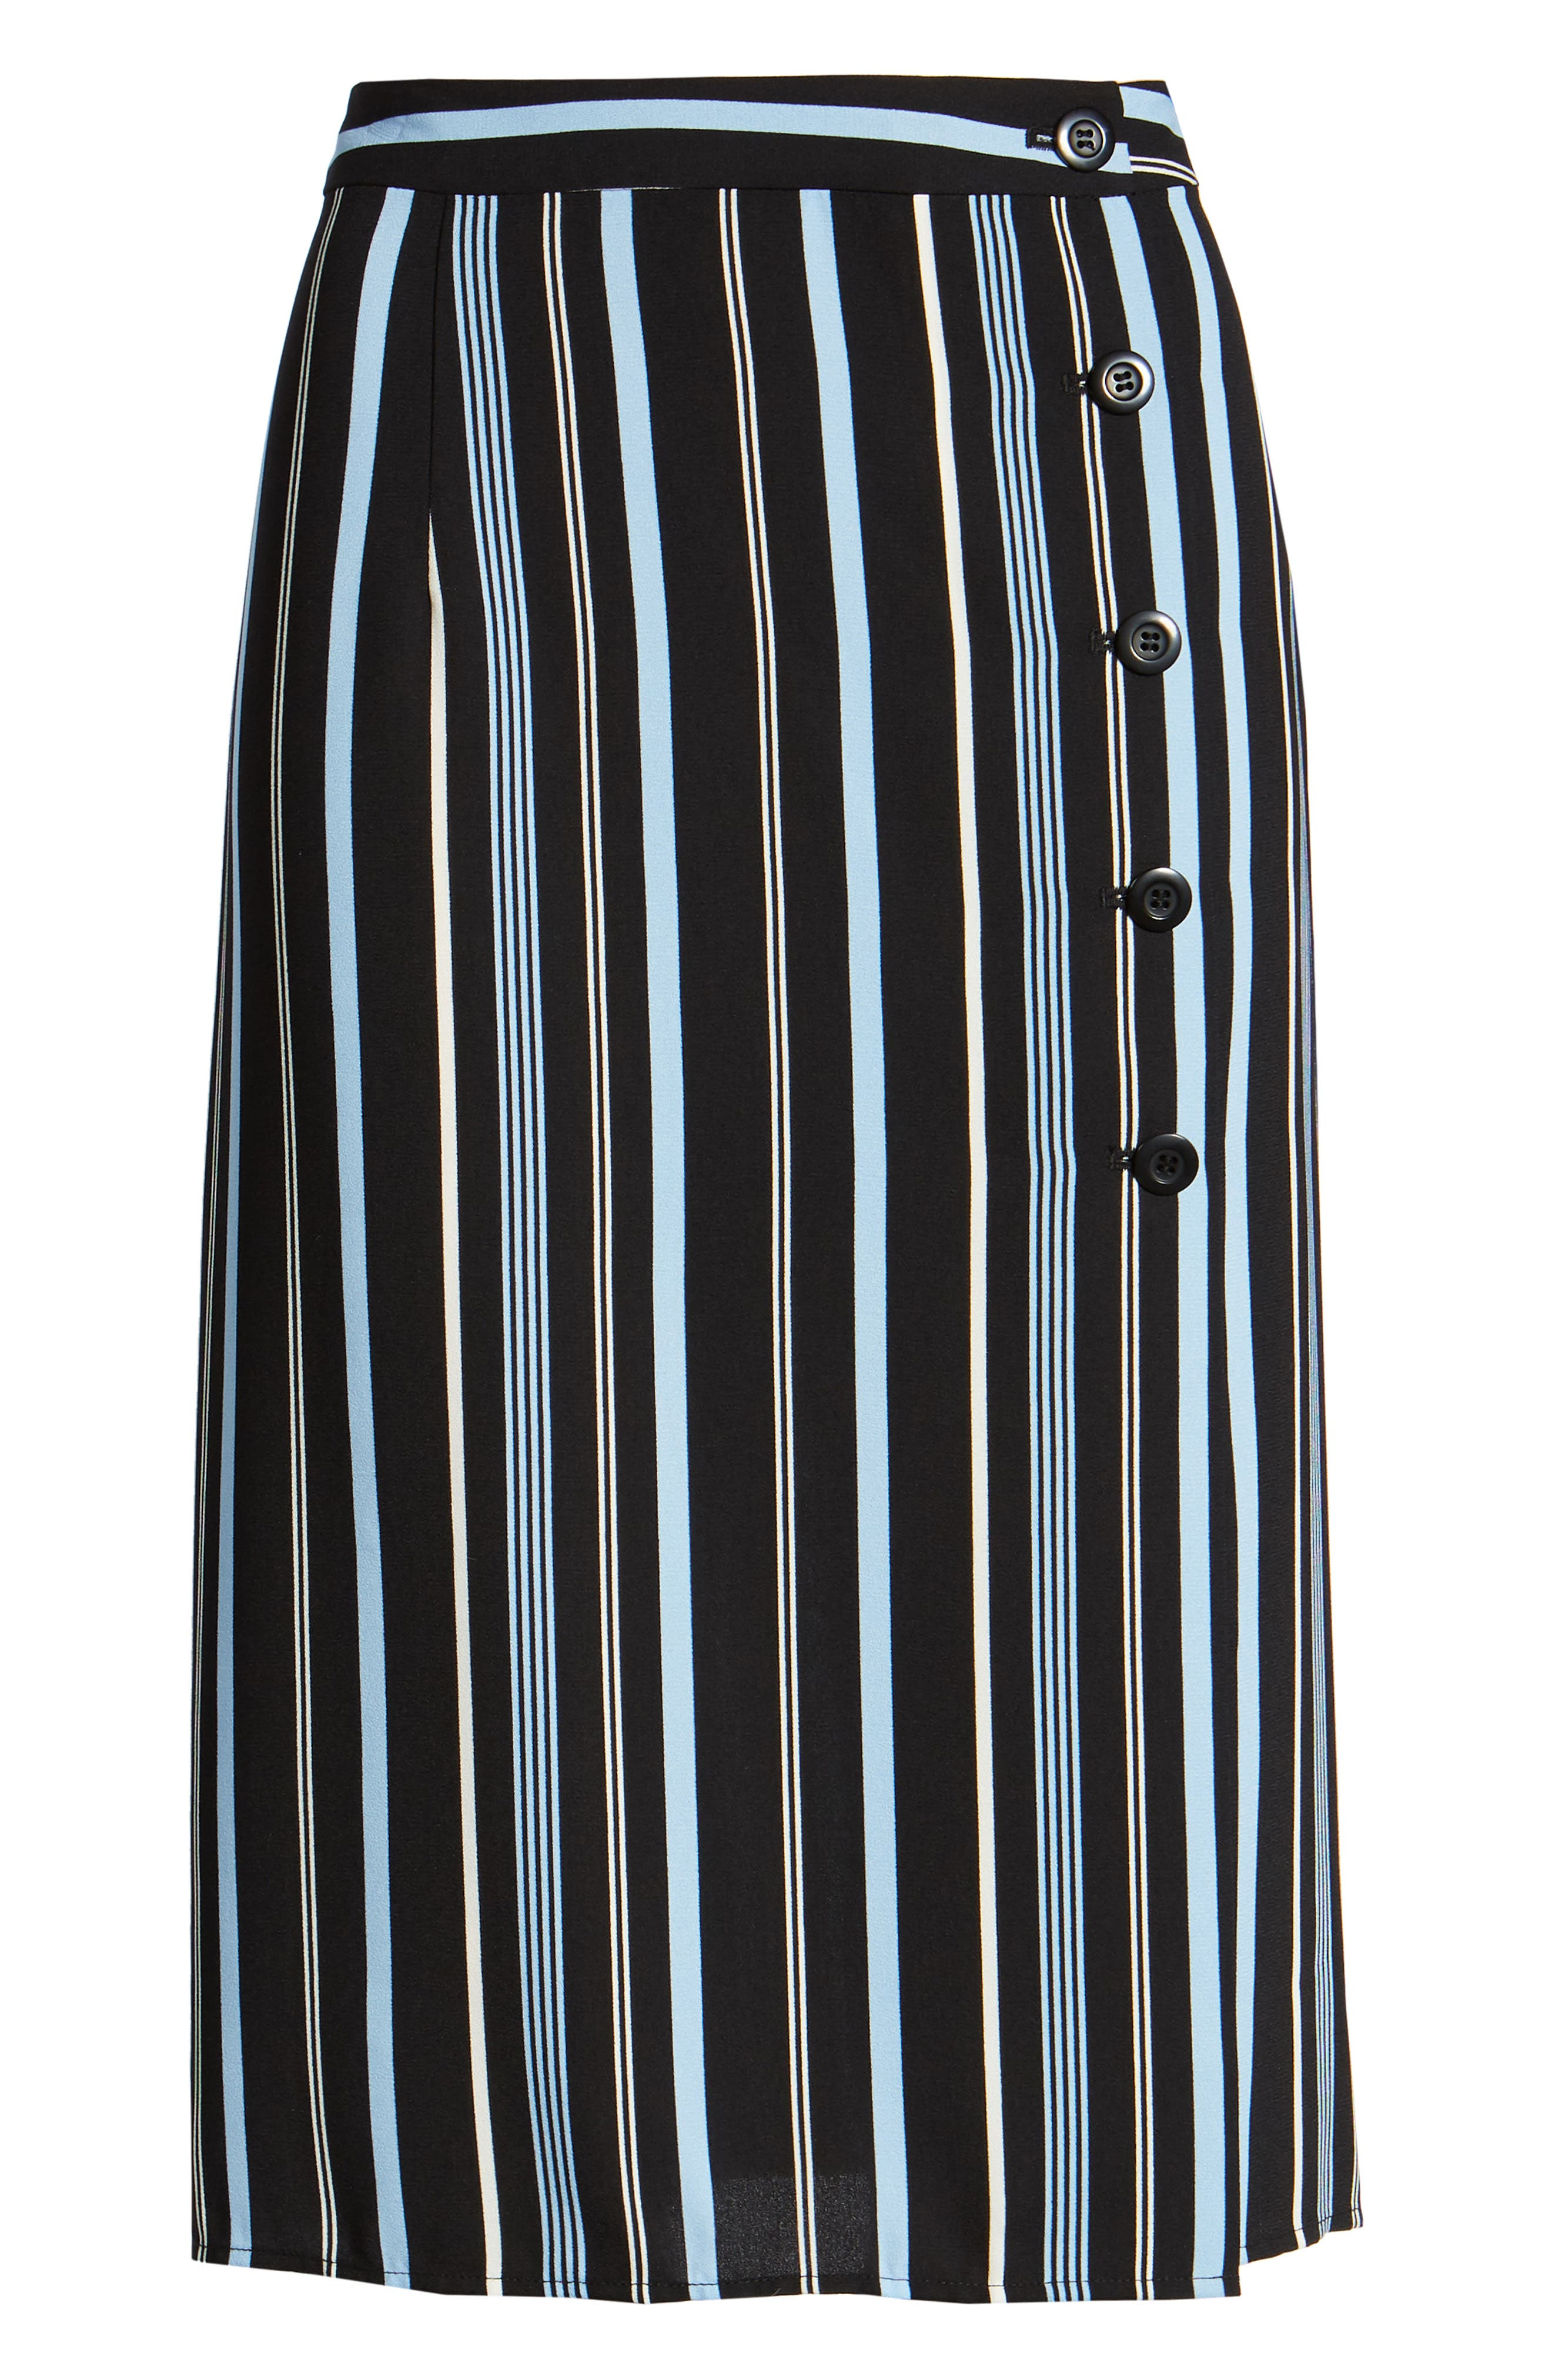 Button Wrap Skirt,                             Alternate thumbnail 7, color,                             BLACK MULTI COLORED STRIPE